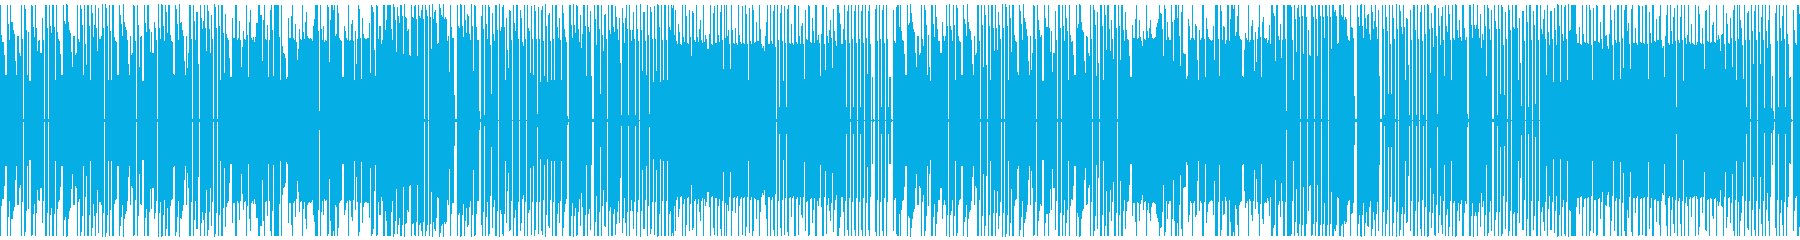 FC風ループ スチームワールドの再生済みの波形